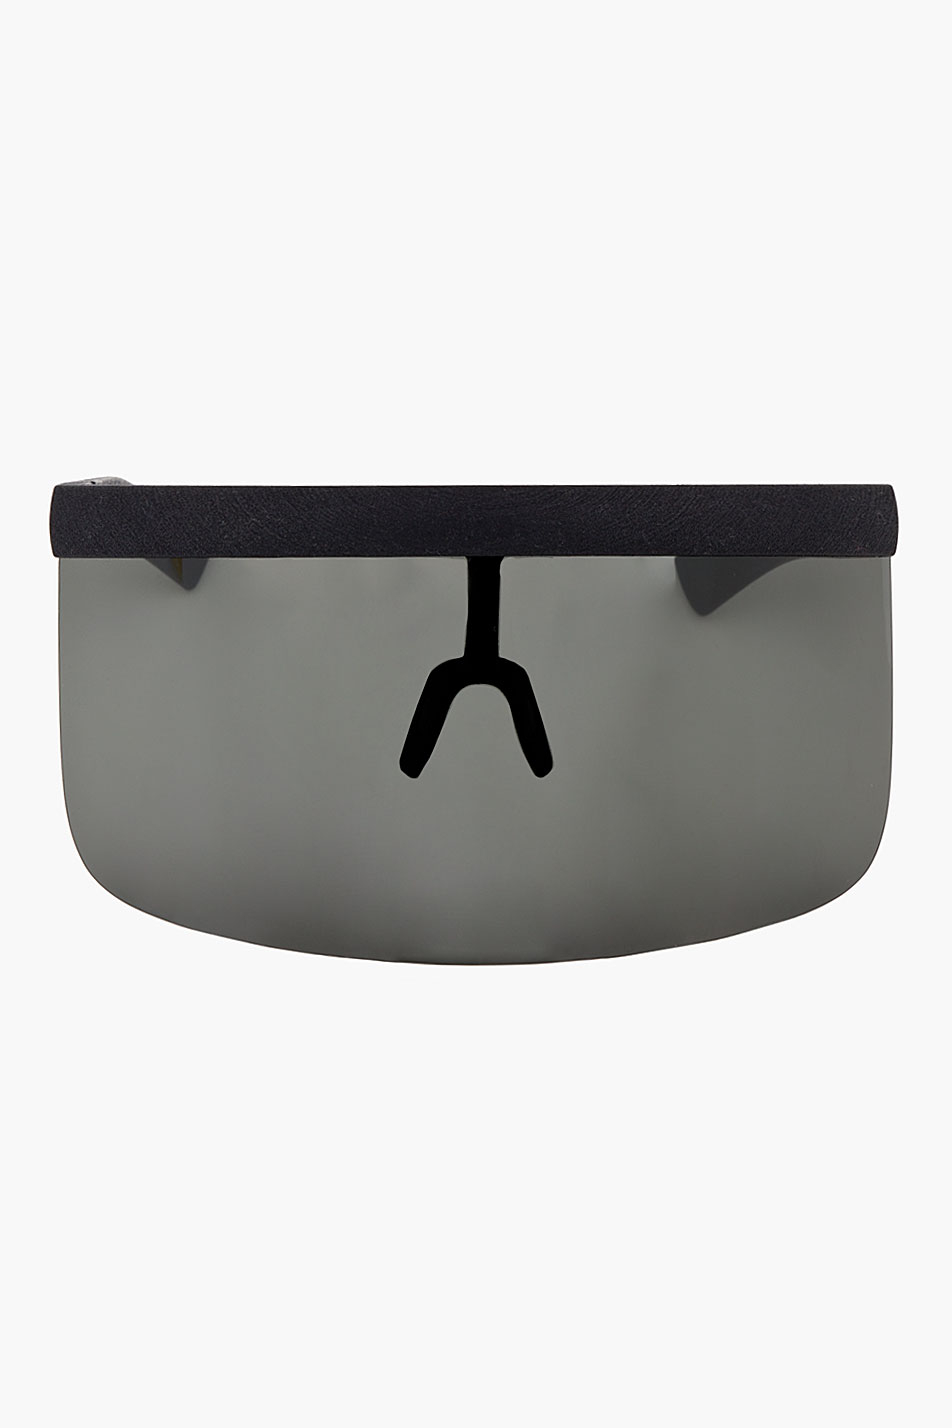 Mykita oversized sunglasses Free Shipping Browse Really Cheap Price Footlocker Finishline Good Selling Cheap Price IEXA9Ibo